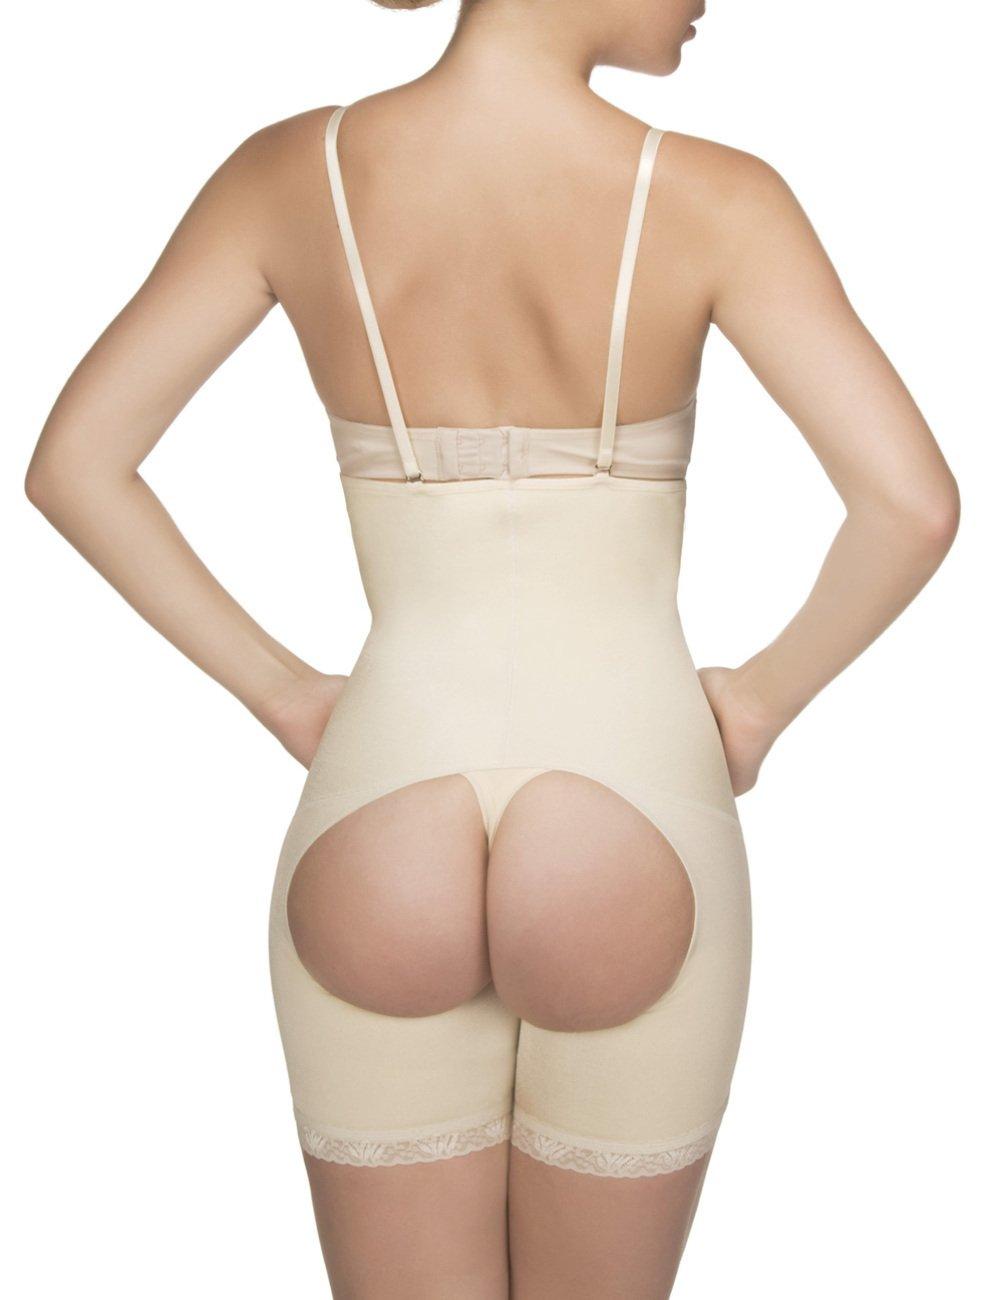 6e6cb6e1536 Amazon.com: Vedette 504 Isabelle Strapless Mid Thigh Body w/ Buttock  Enhancer 2XS 30 Black: Health & Personal Care